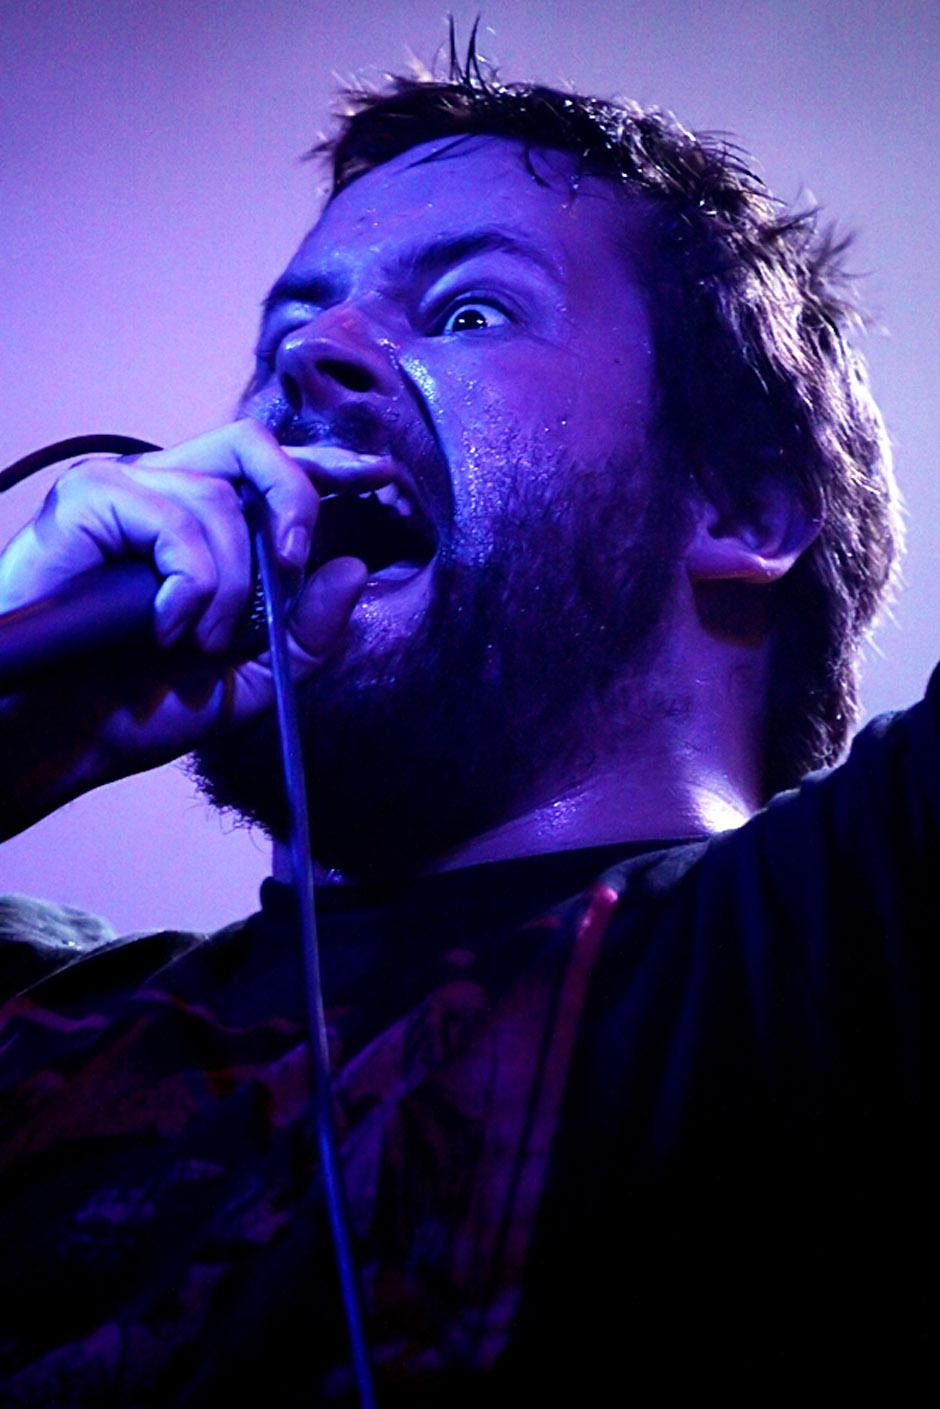 The Black Dahlia Murder live, 22.02.2013, Geiselwind, Music Hall